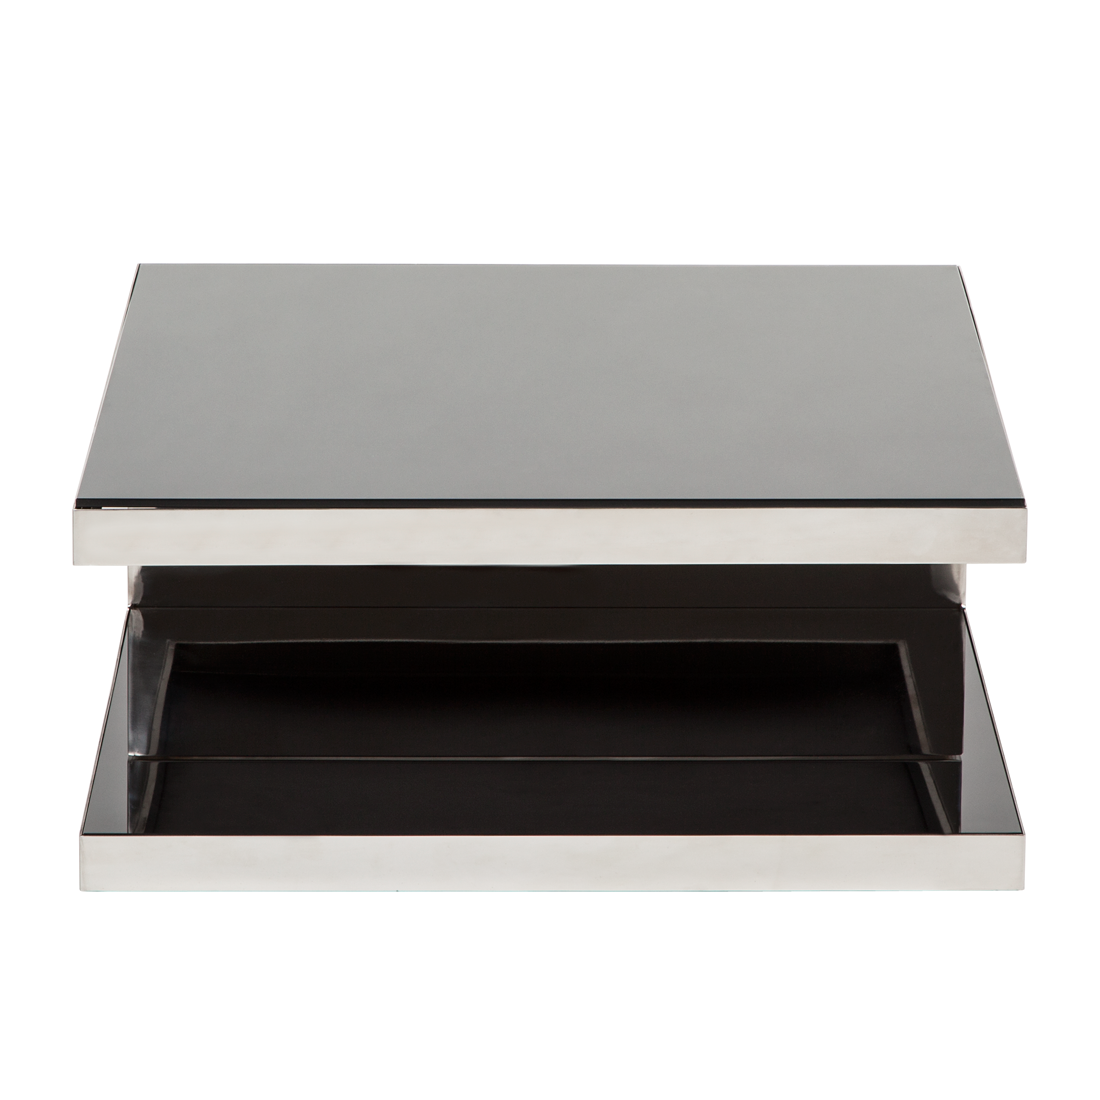 couchtisch silber bestseller shop f r m bel und. Black Bedroom Furniture Sets. Home Design Ideas